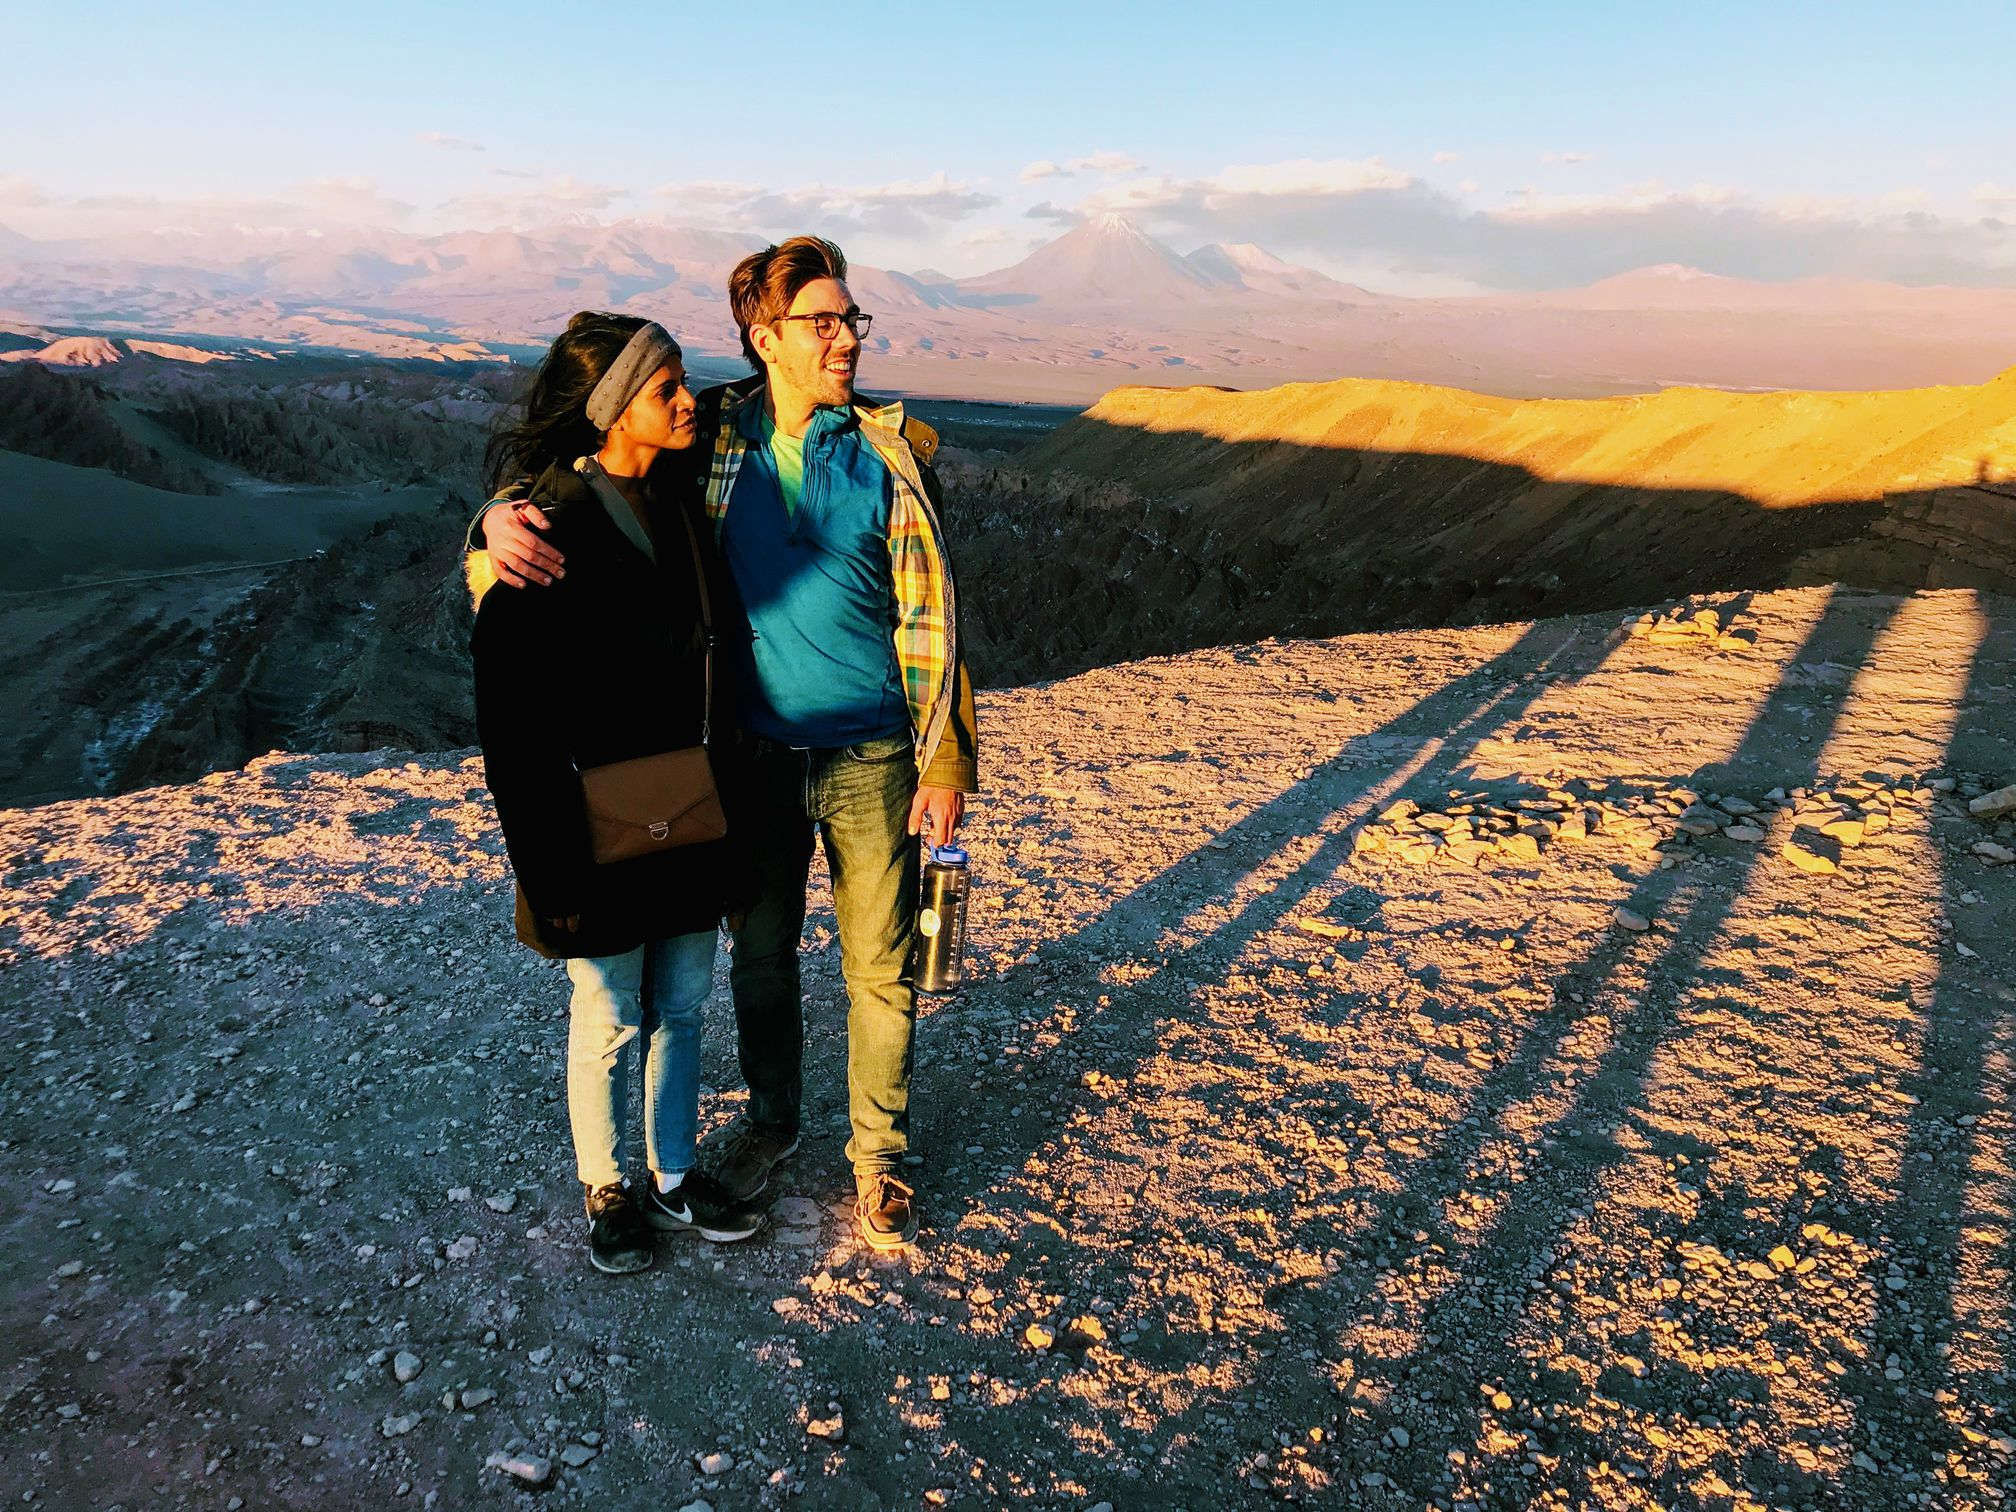 Valle de Muerte Atacama Desert Chile